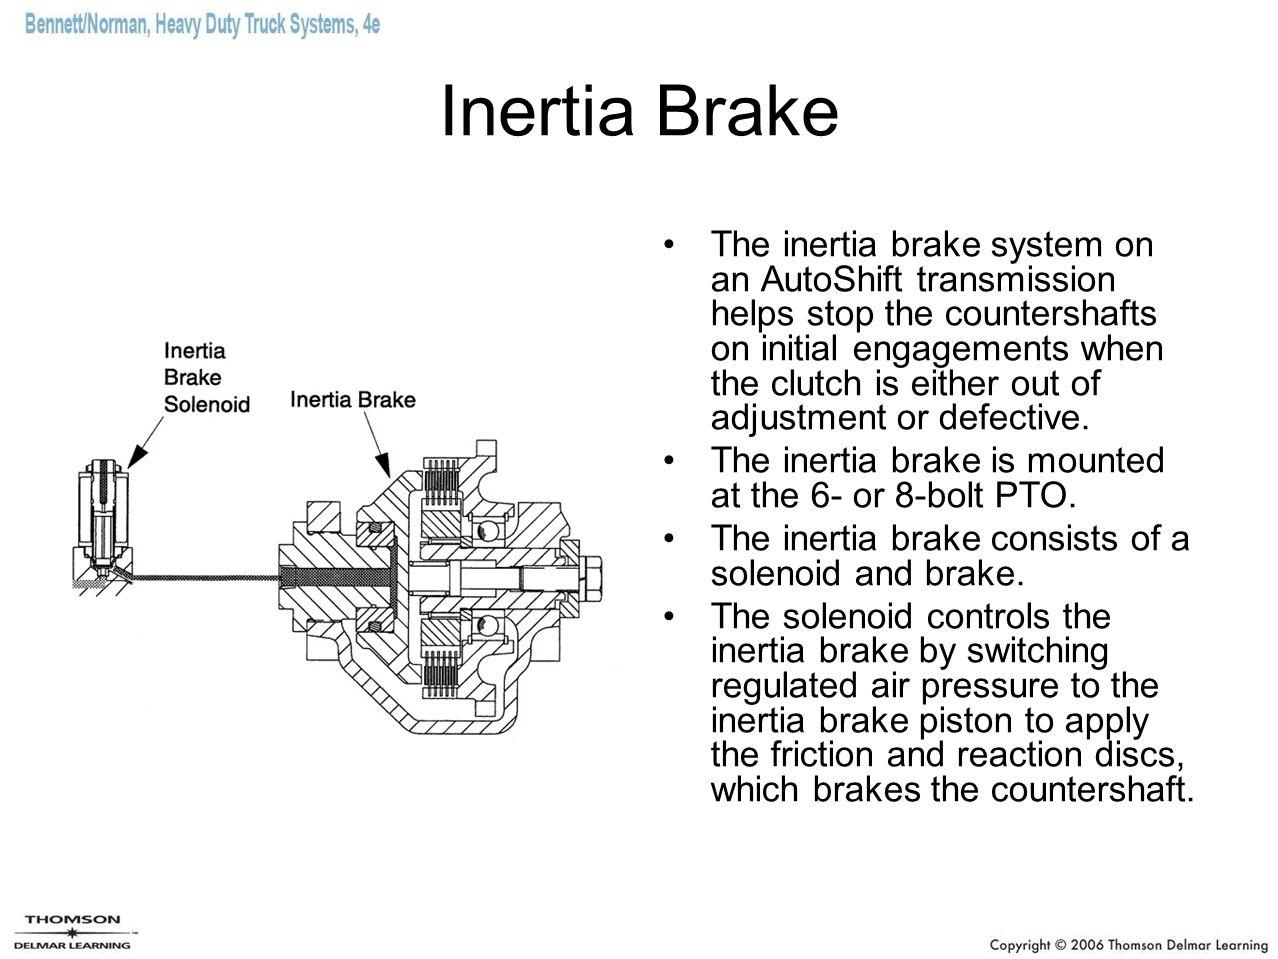 Inertia Brake eaton ultrashift troubleshooting manual related keywords